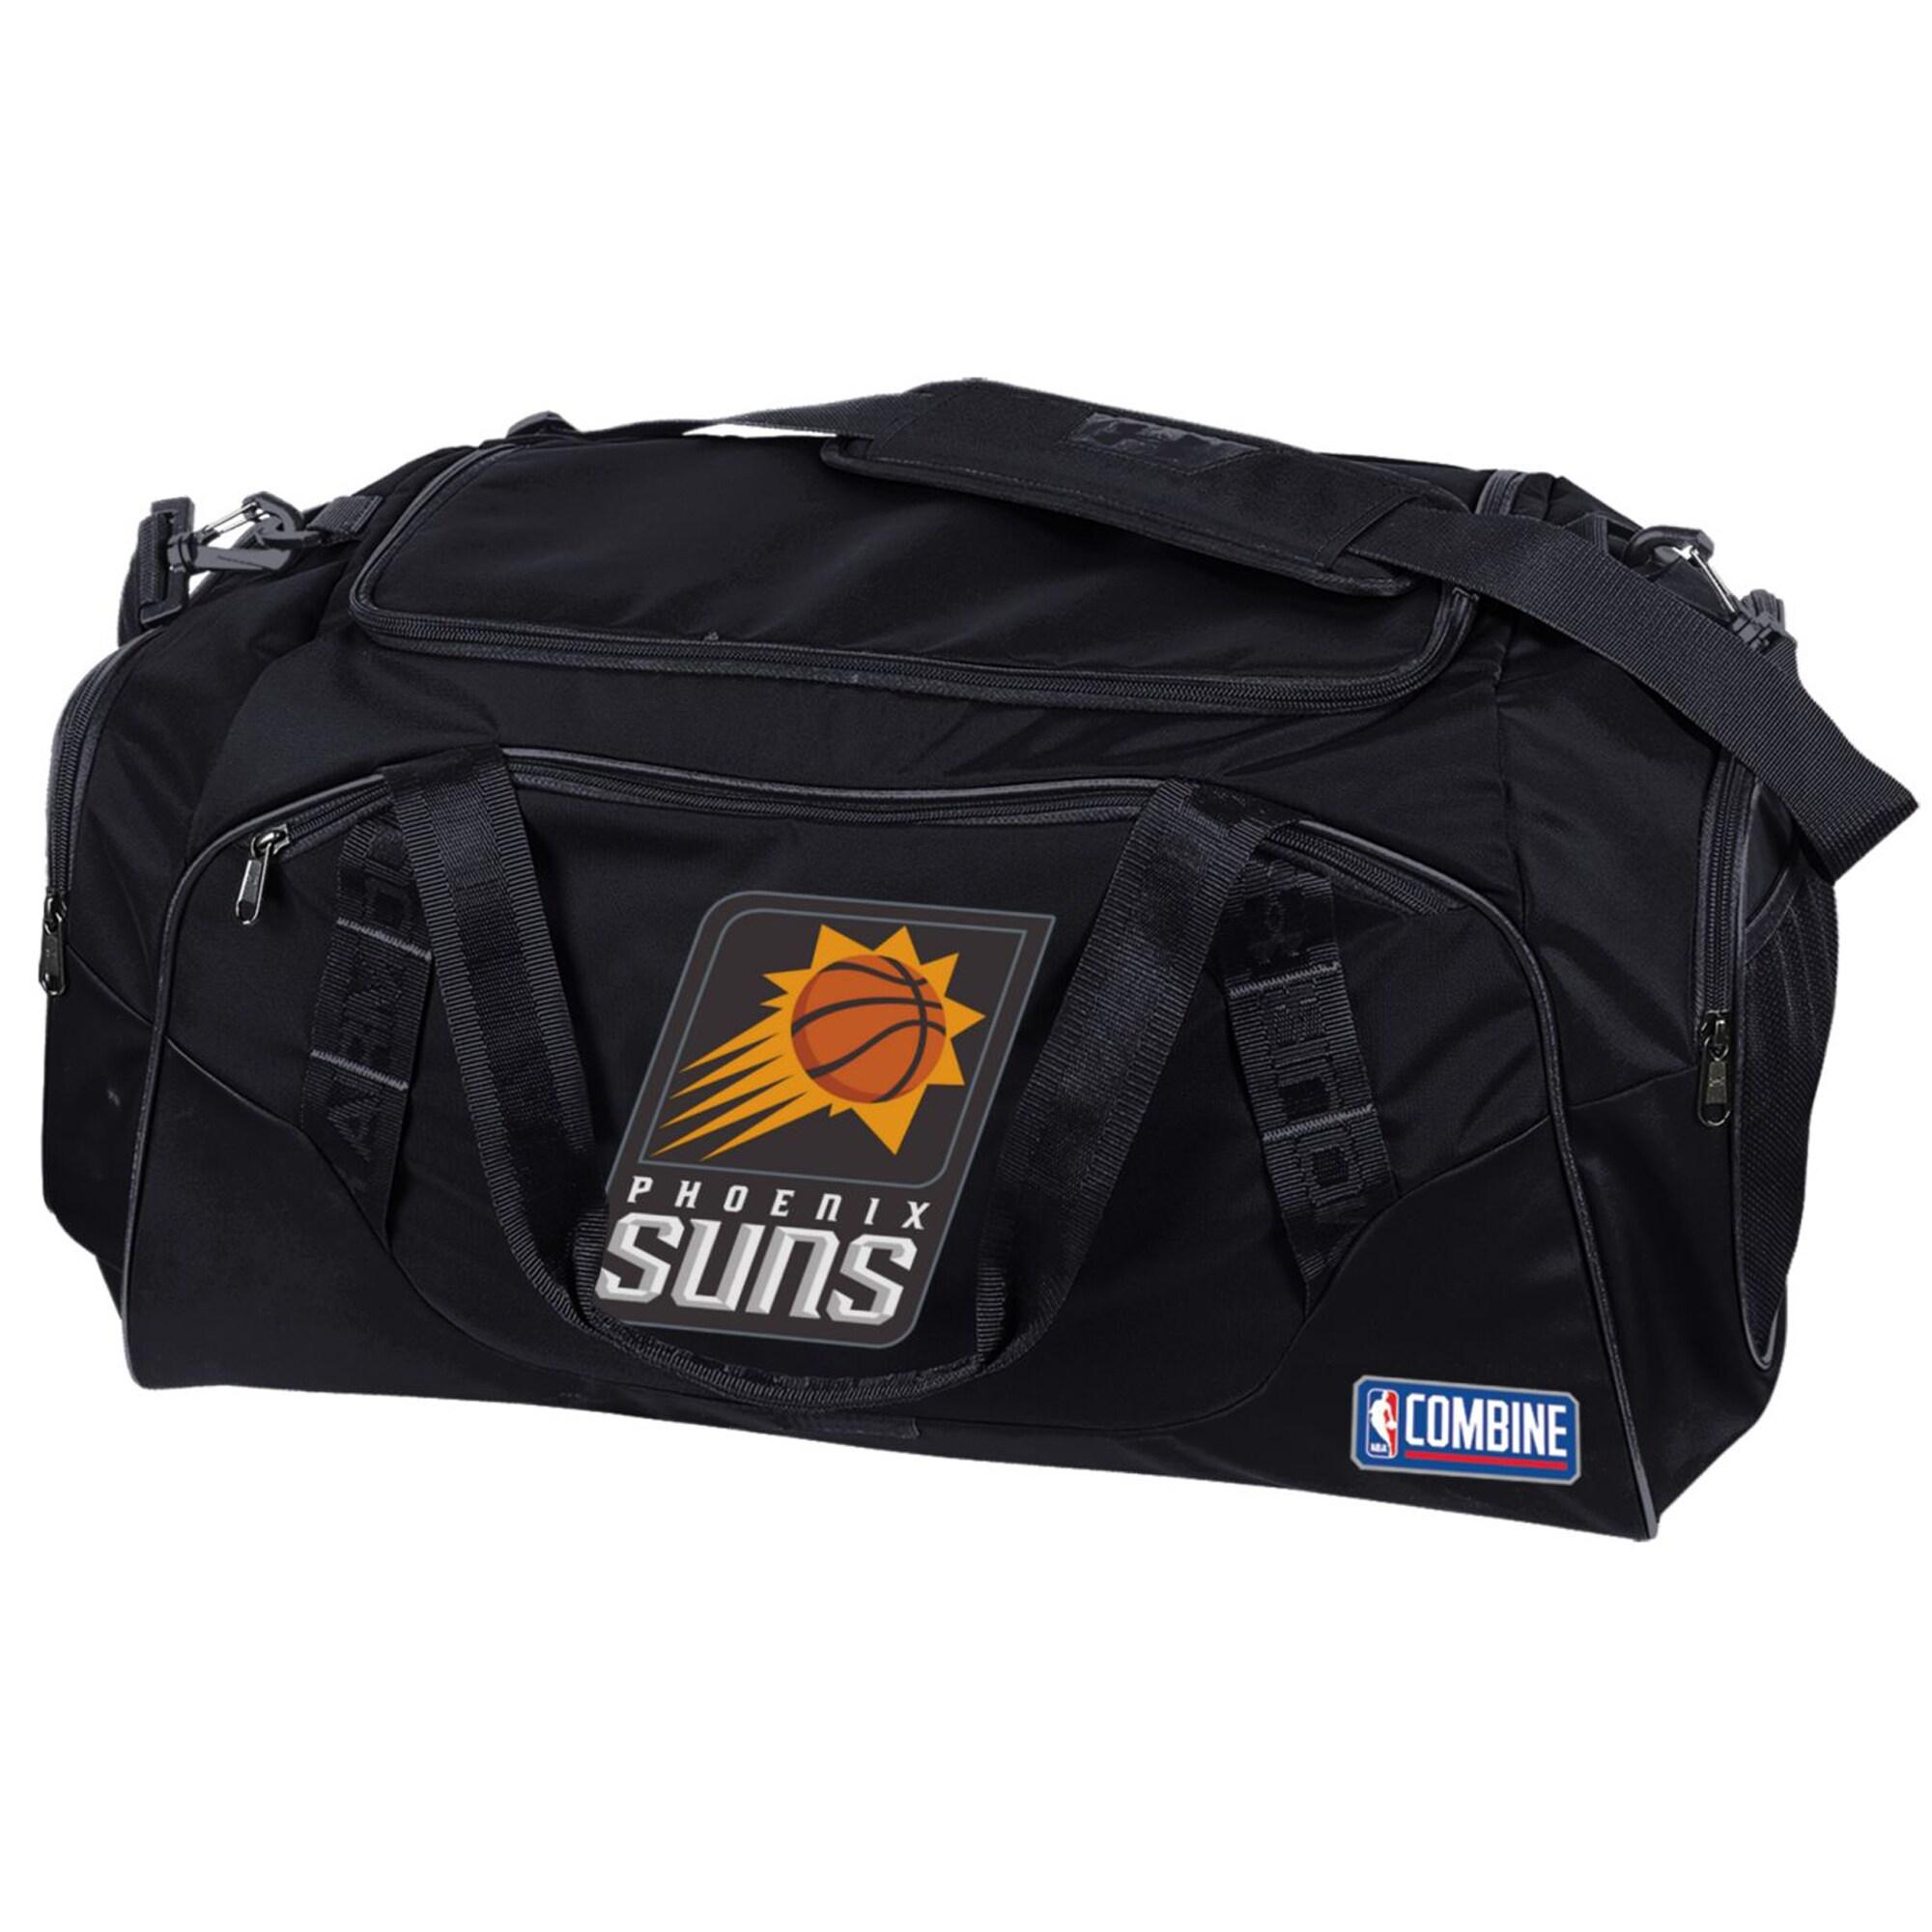 Phoenix Suns Under Armour Undeniable Duffle